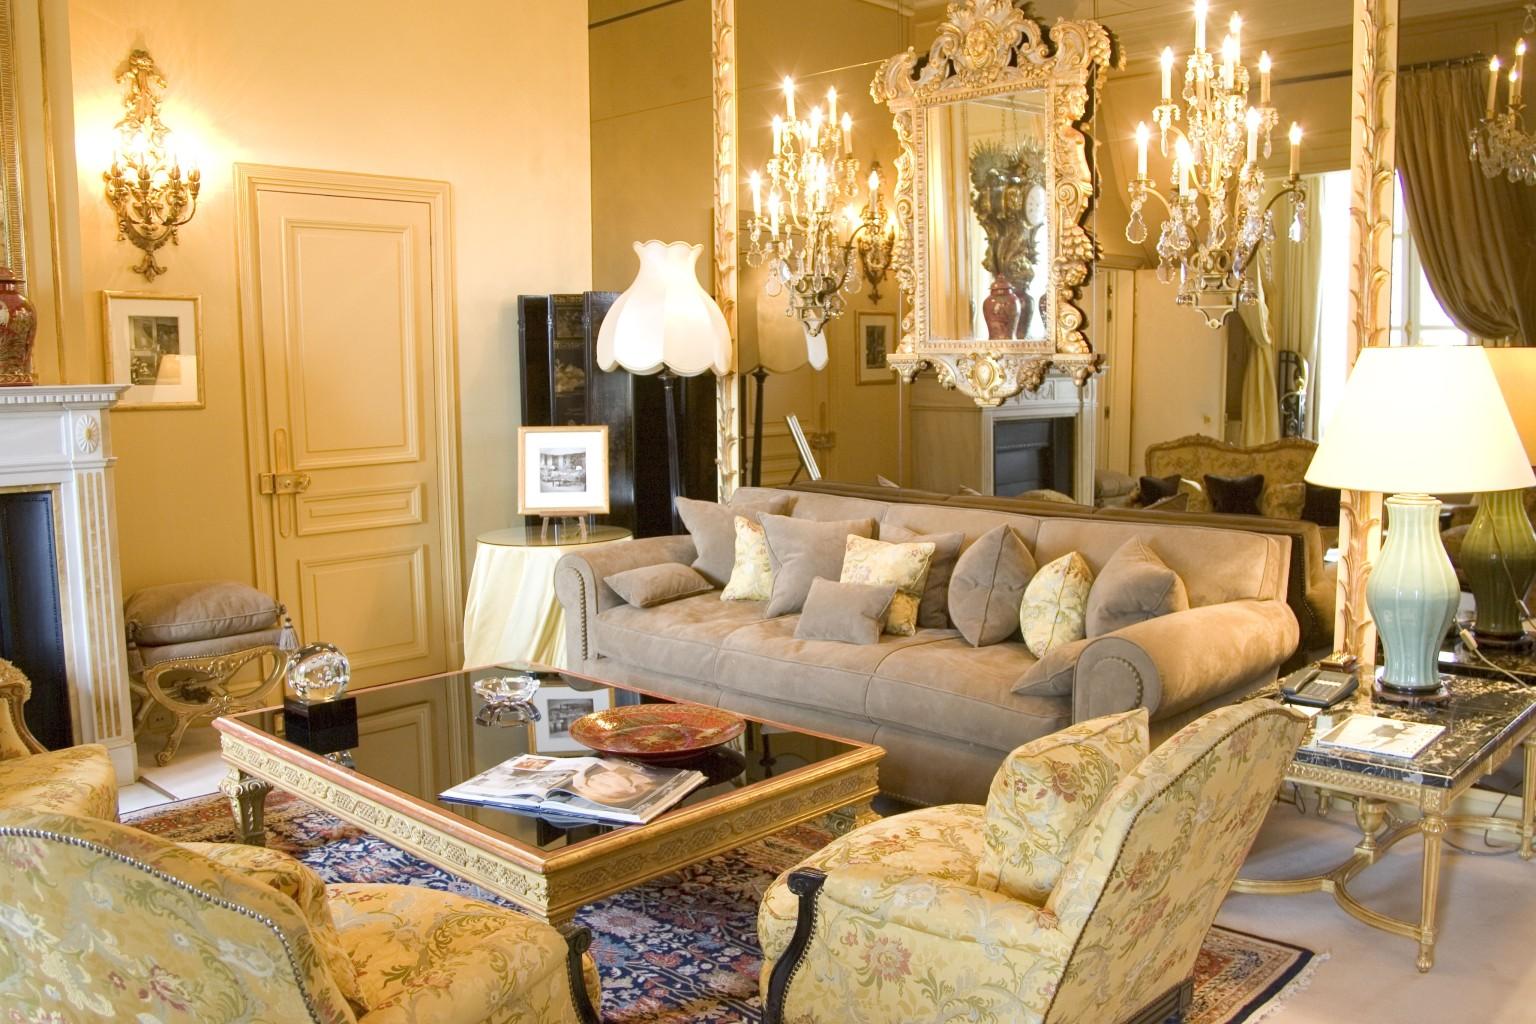 A Rare Look Inside Coco Chanel S Fabulous Parisian